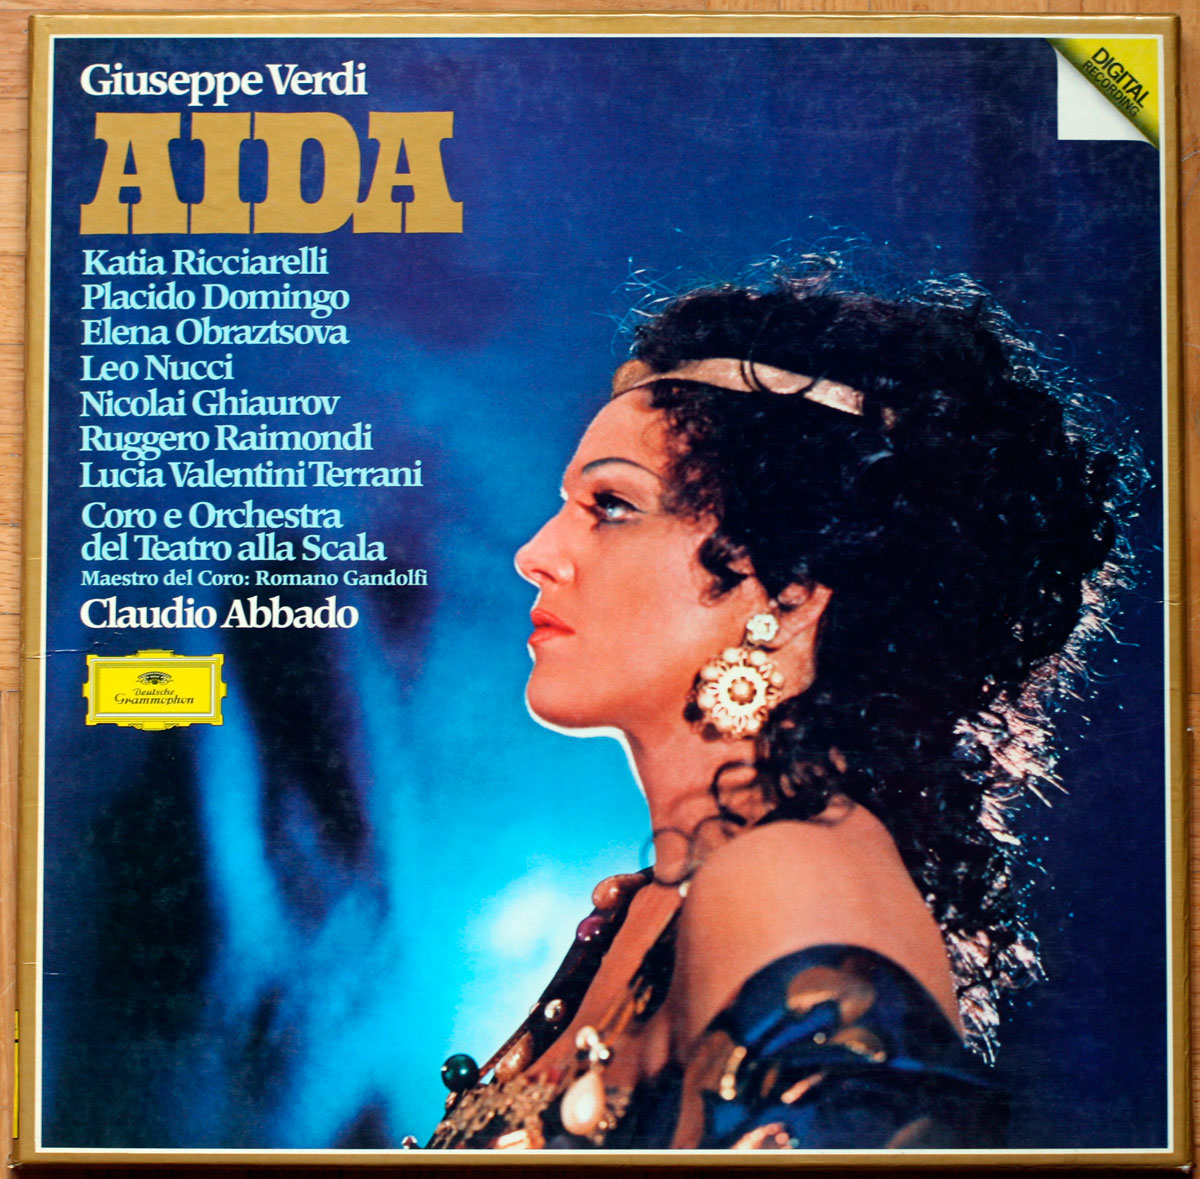 DGG 2741014 Verdi Aida Abbado